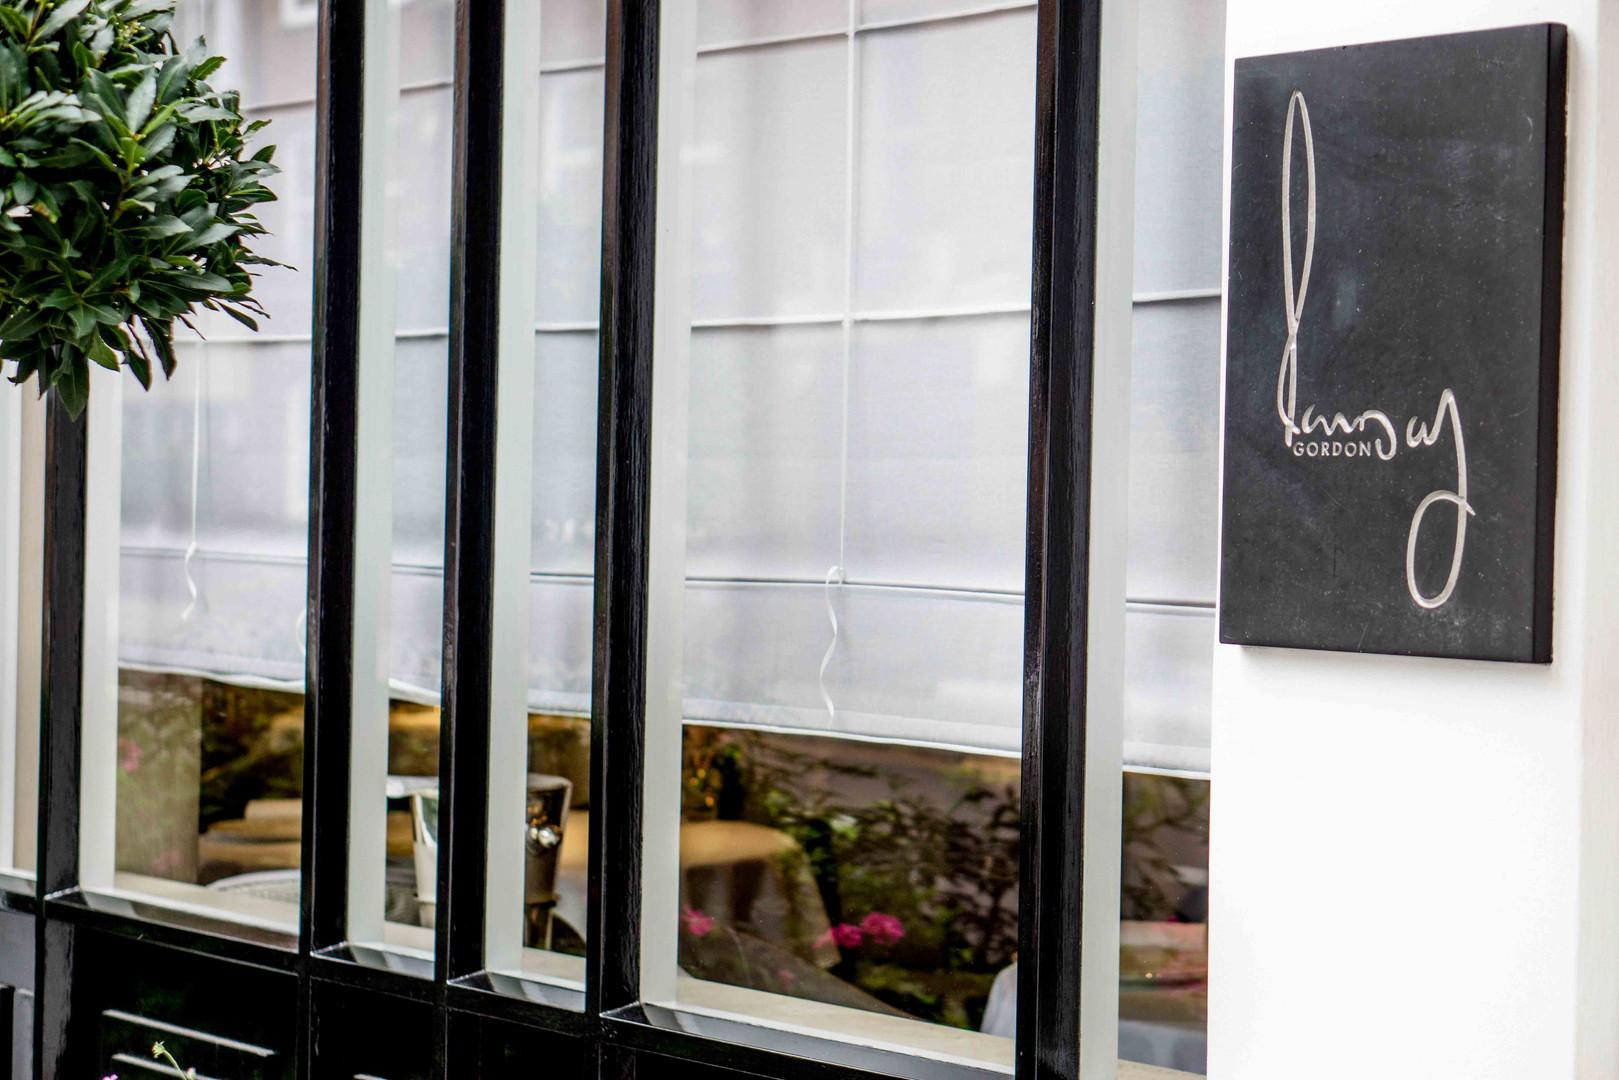 Restaurant Gordon Ramsay-12.jpg